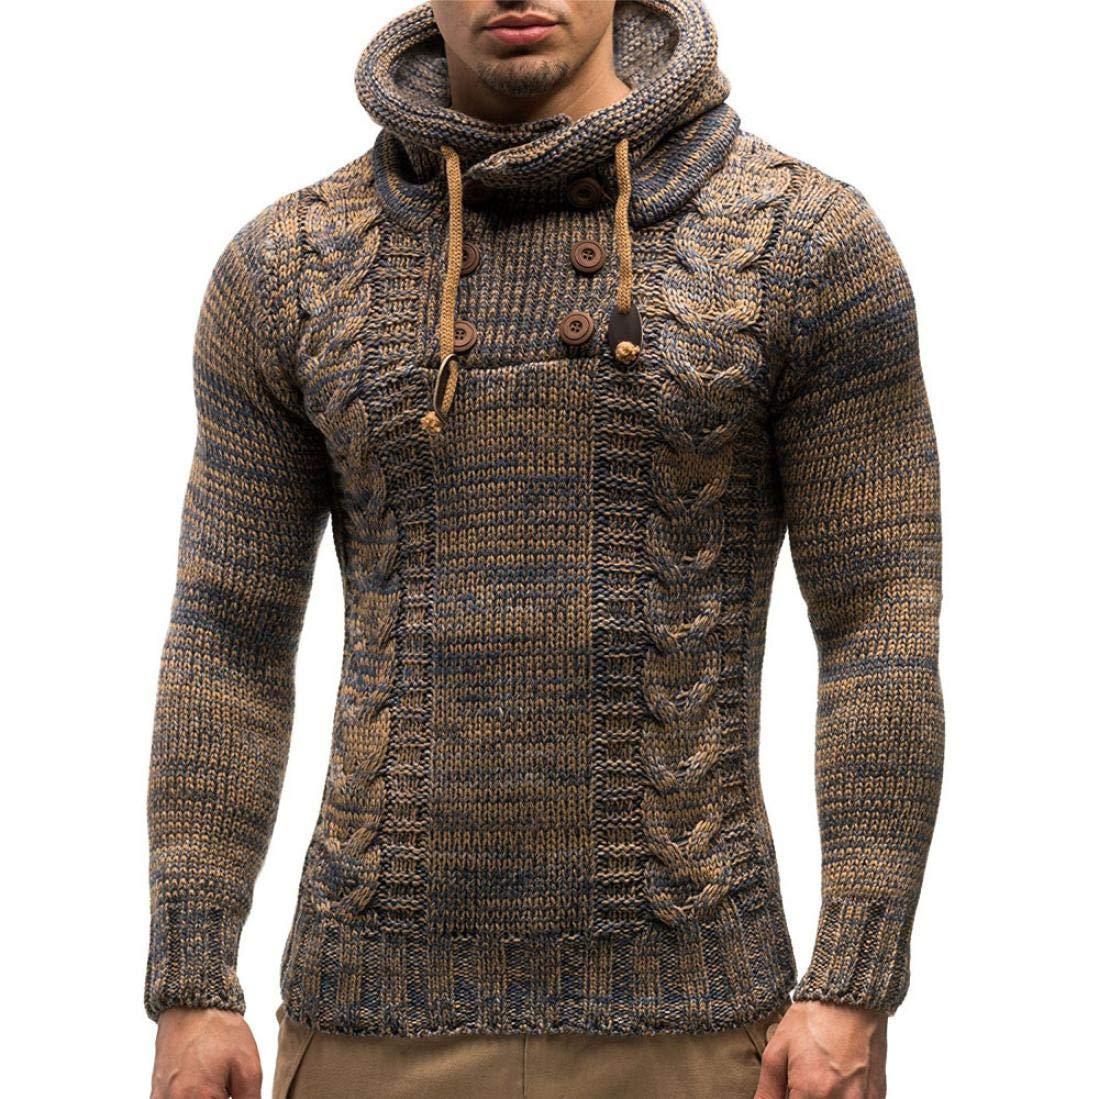 UJUNAORTOP Men's Autumn Winter Pullover Knitted Cardigan Coat Hooded Sweater Jacket Outwear